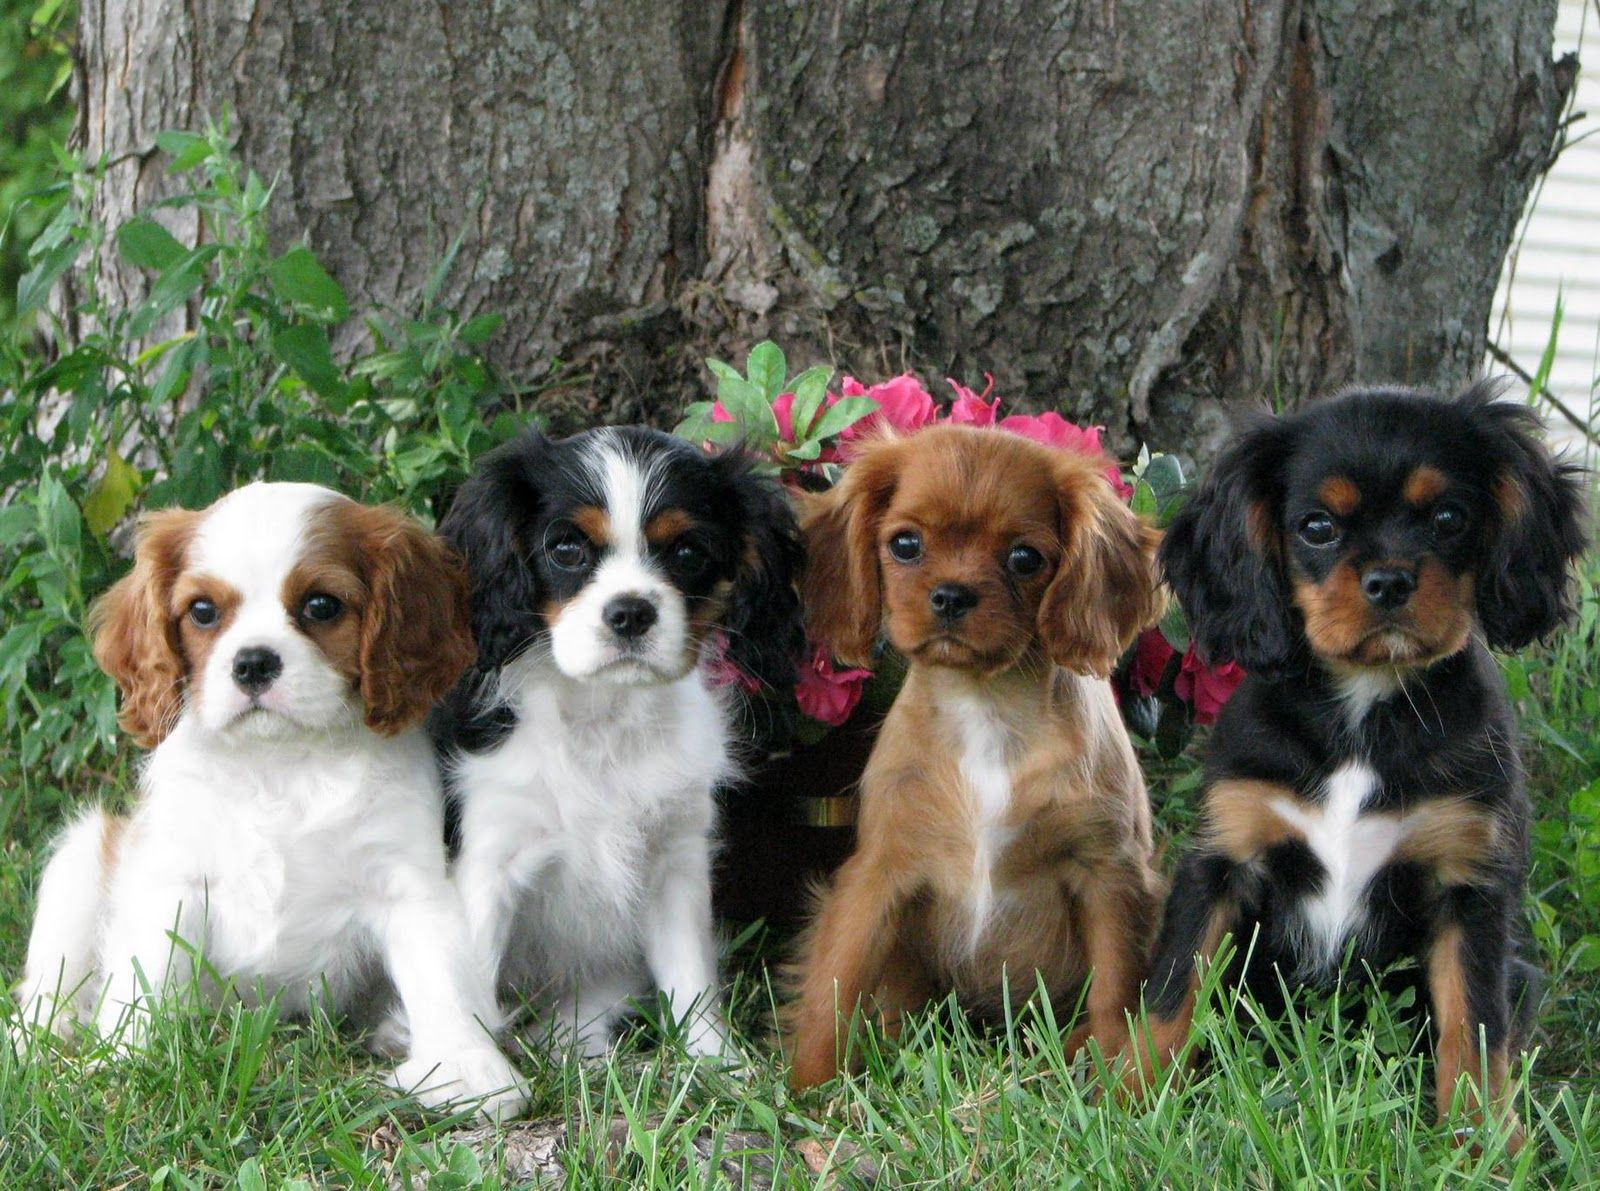 Cavalier King Charles Spaniel Dog Reviews King Charles Cavalier Spaniel Puppy King Charles Puppy Cavalier Puppy